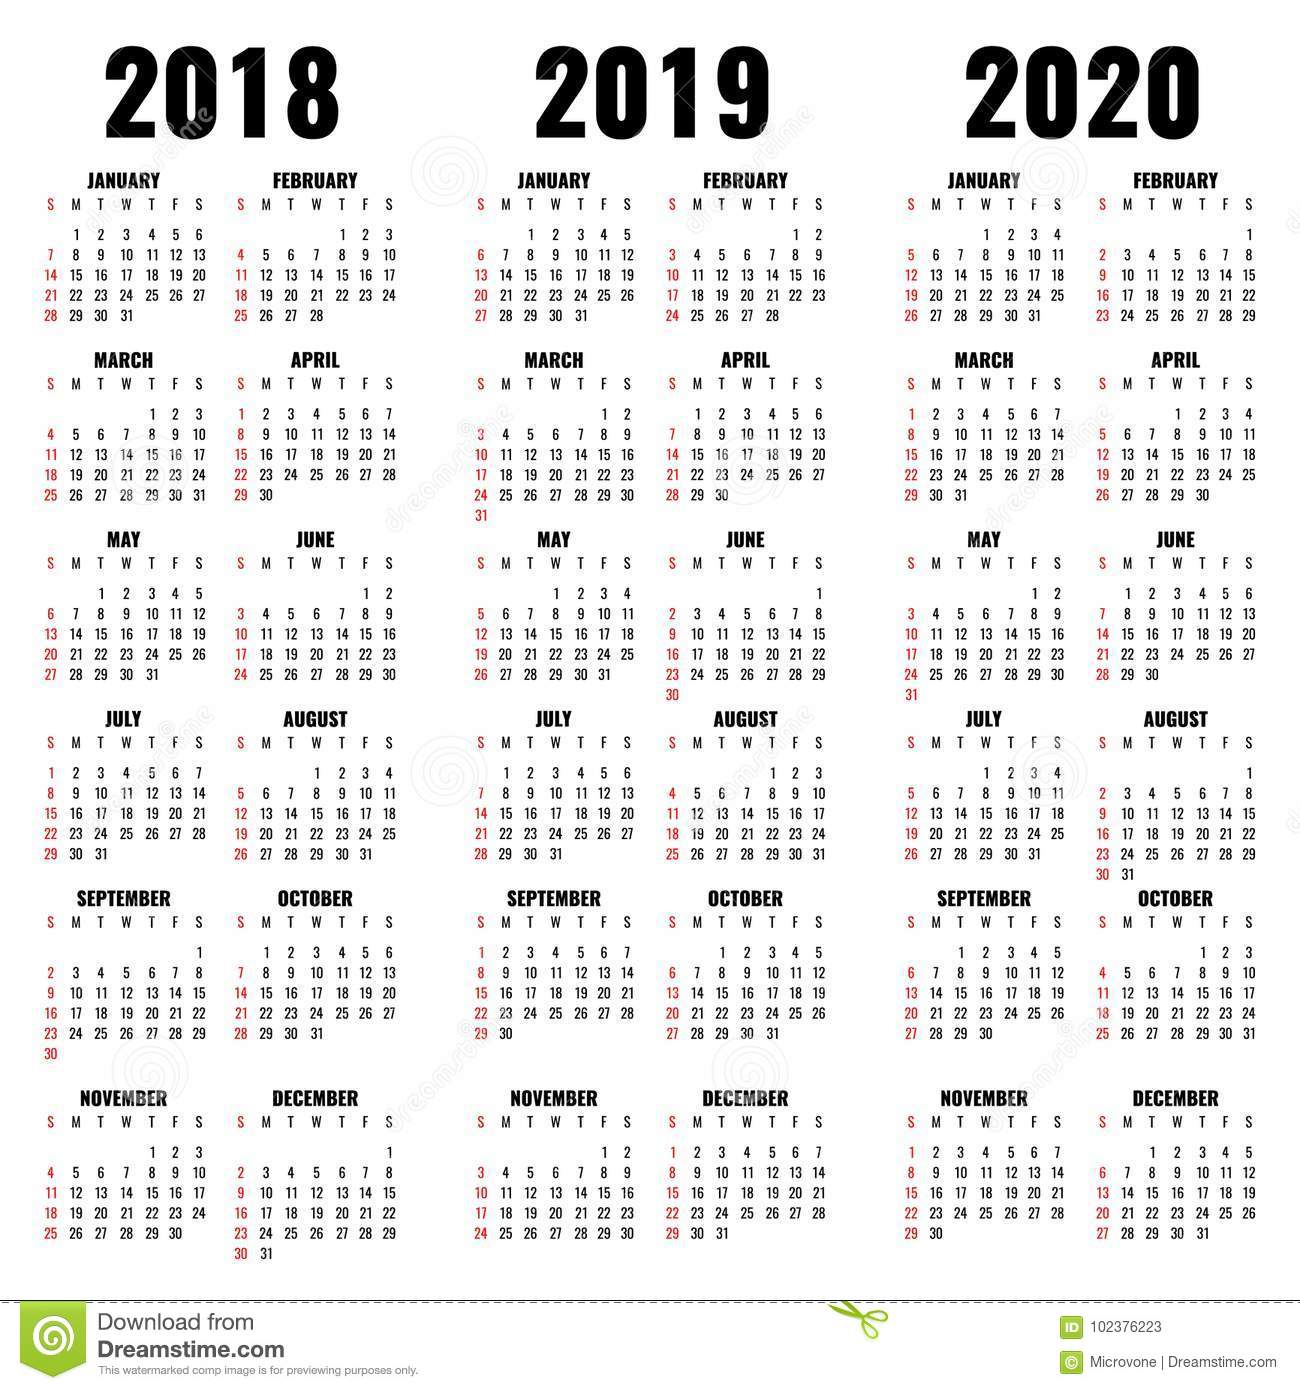 Vector Calendar Template 2018, 2019 And 2020 Years Stock Vector pertaining to 3 Year Calendar Printable 2018 2019 2020